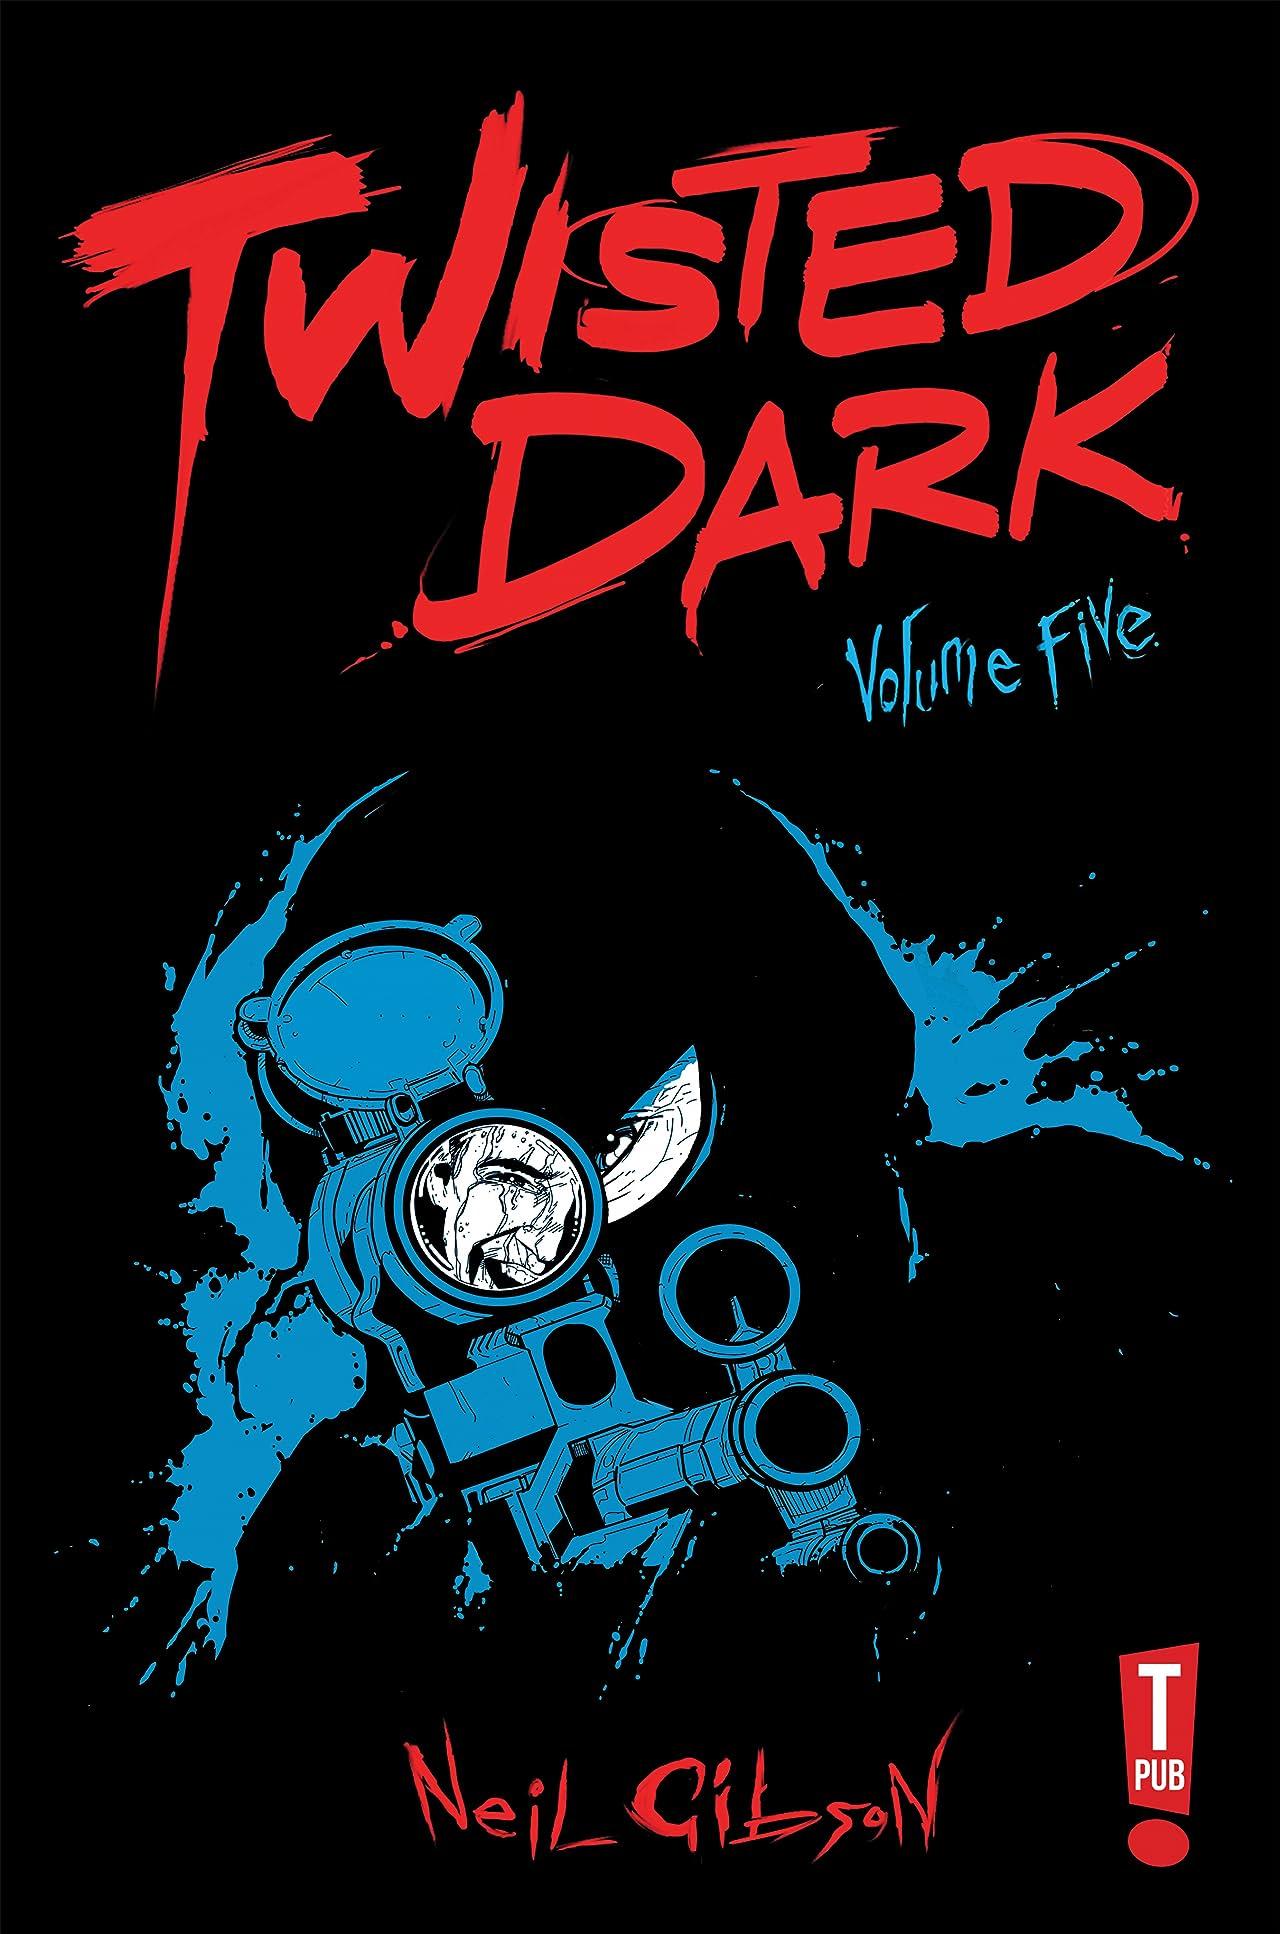 Twisted Dark Vol. 5